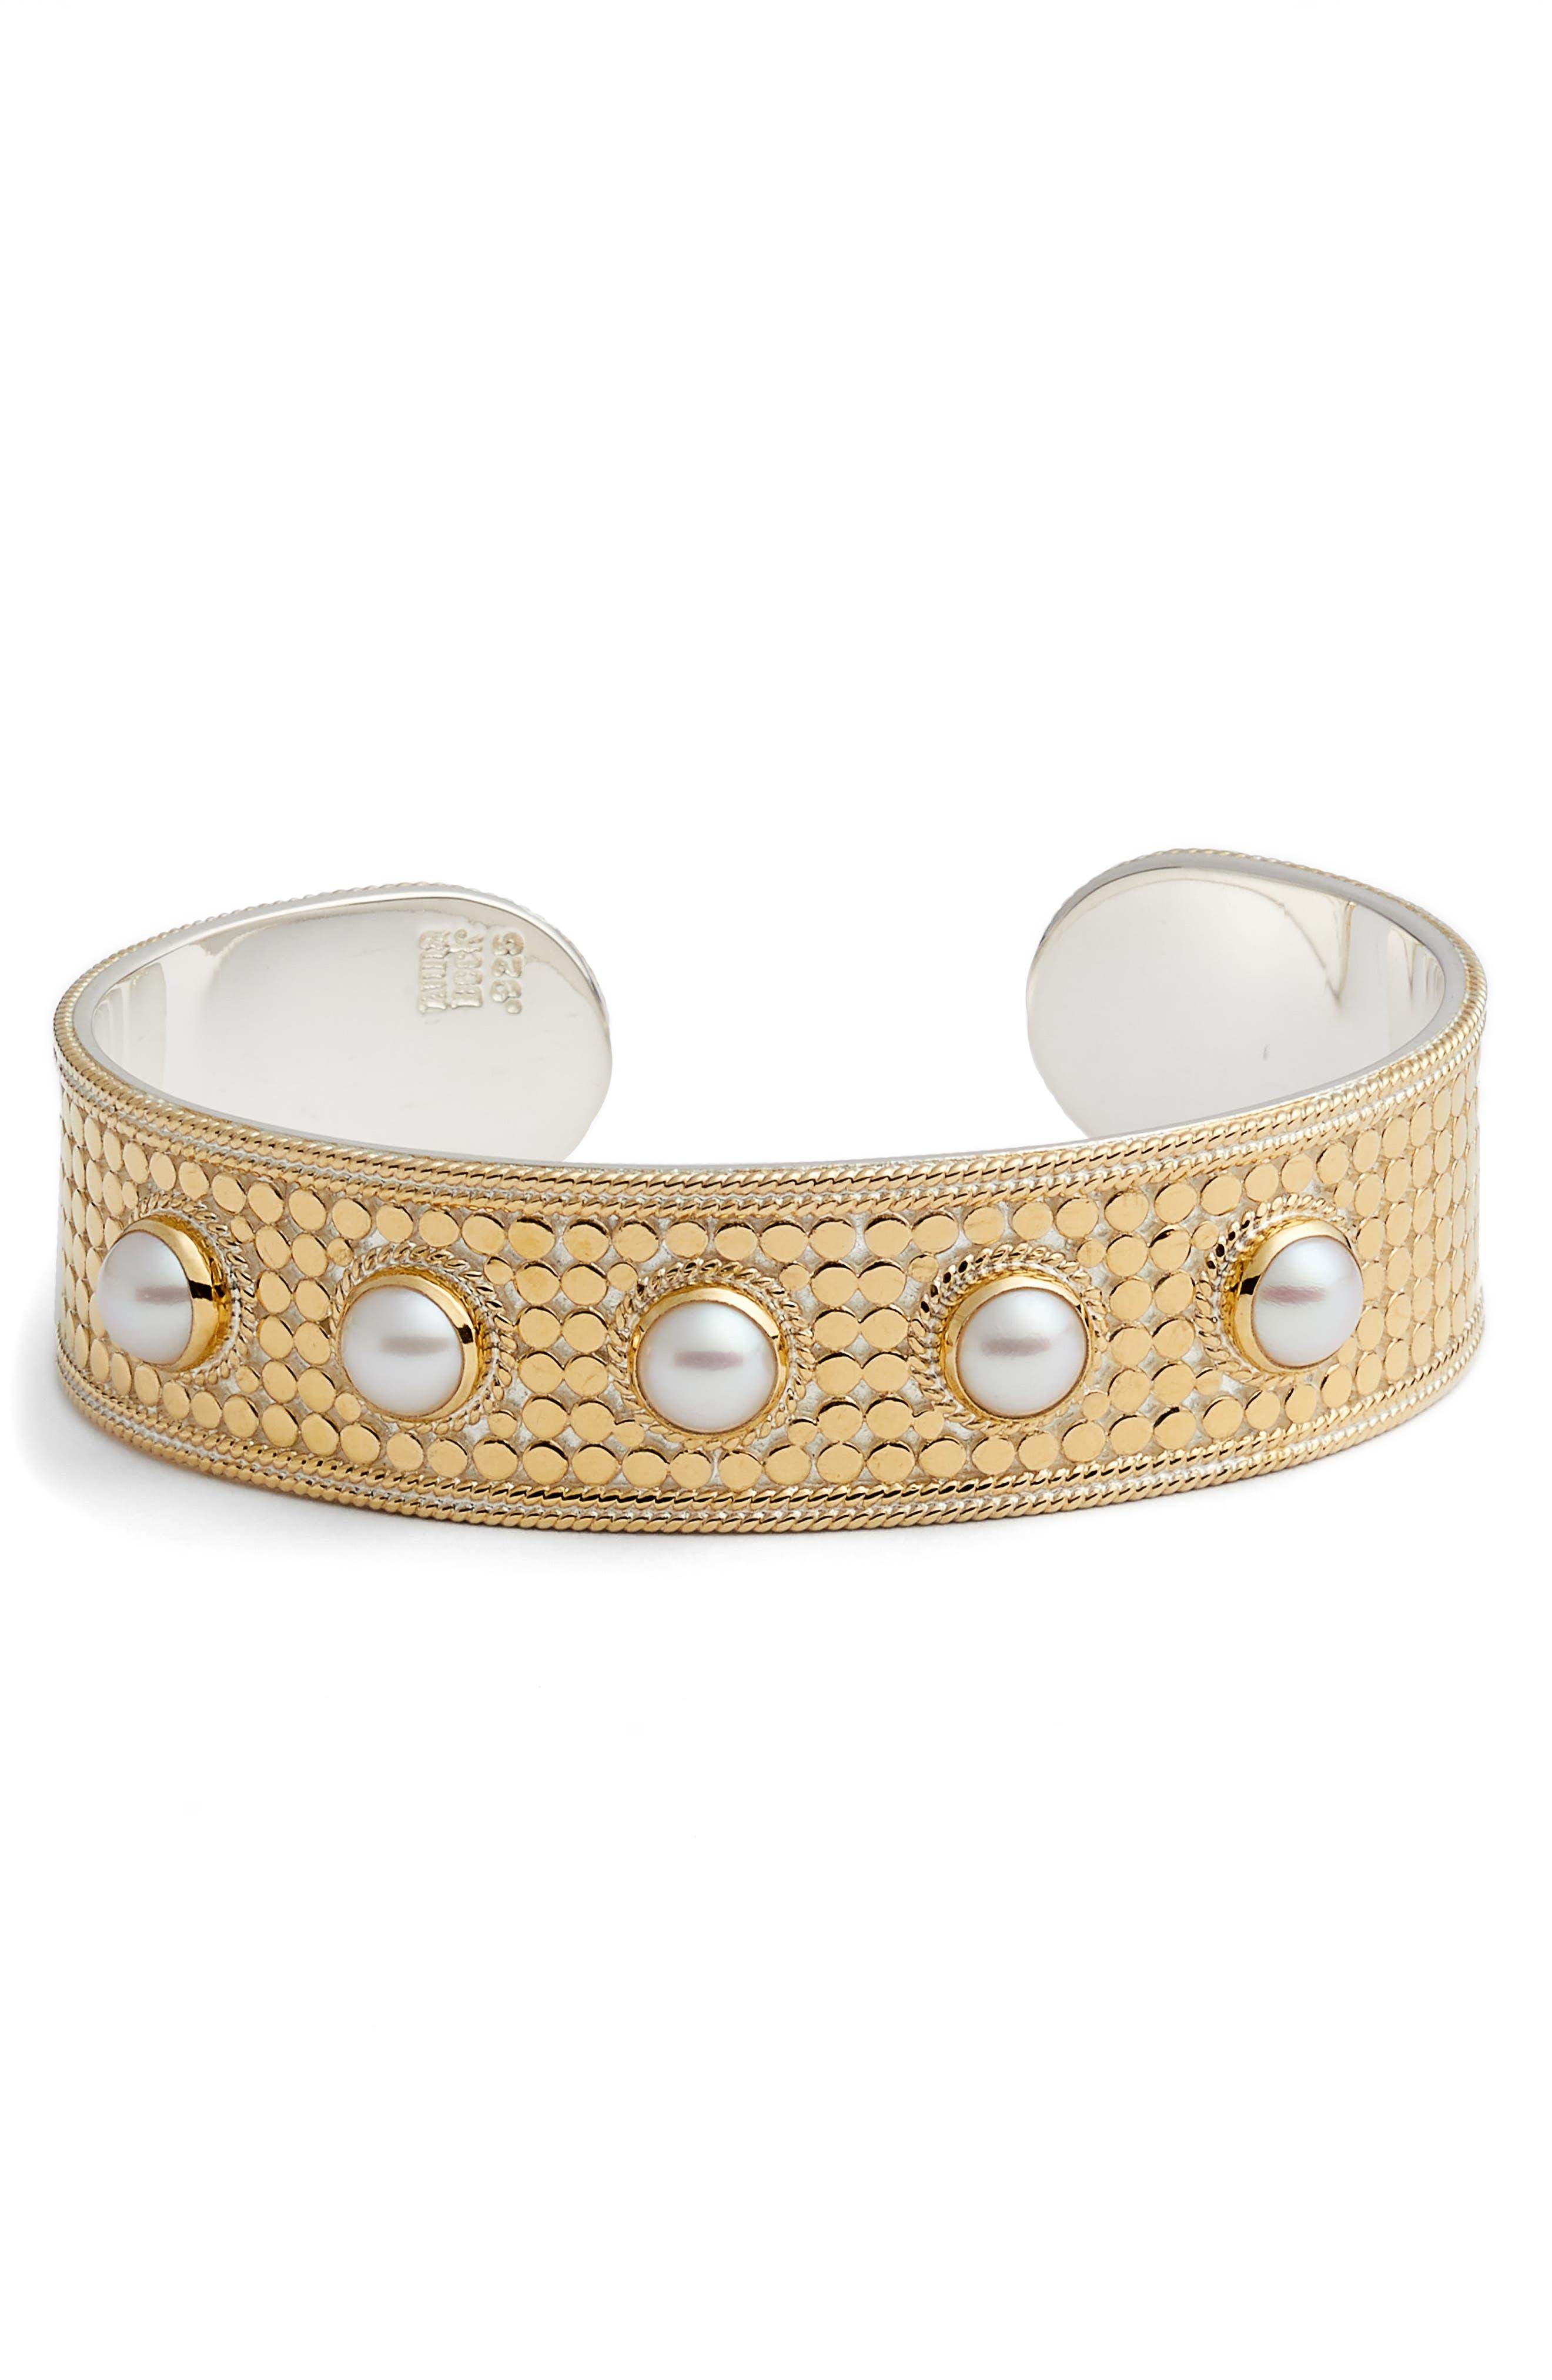 Medium Pearl Cuff Bracelet,                             Main thumbnail 1, color,                             GOLD/ PEARL